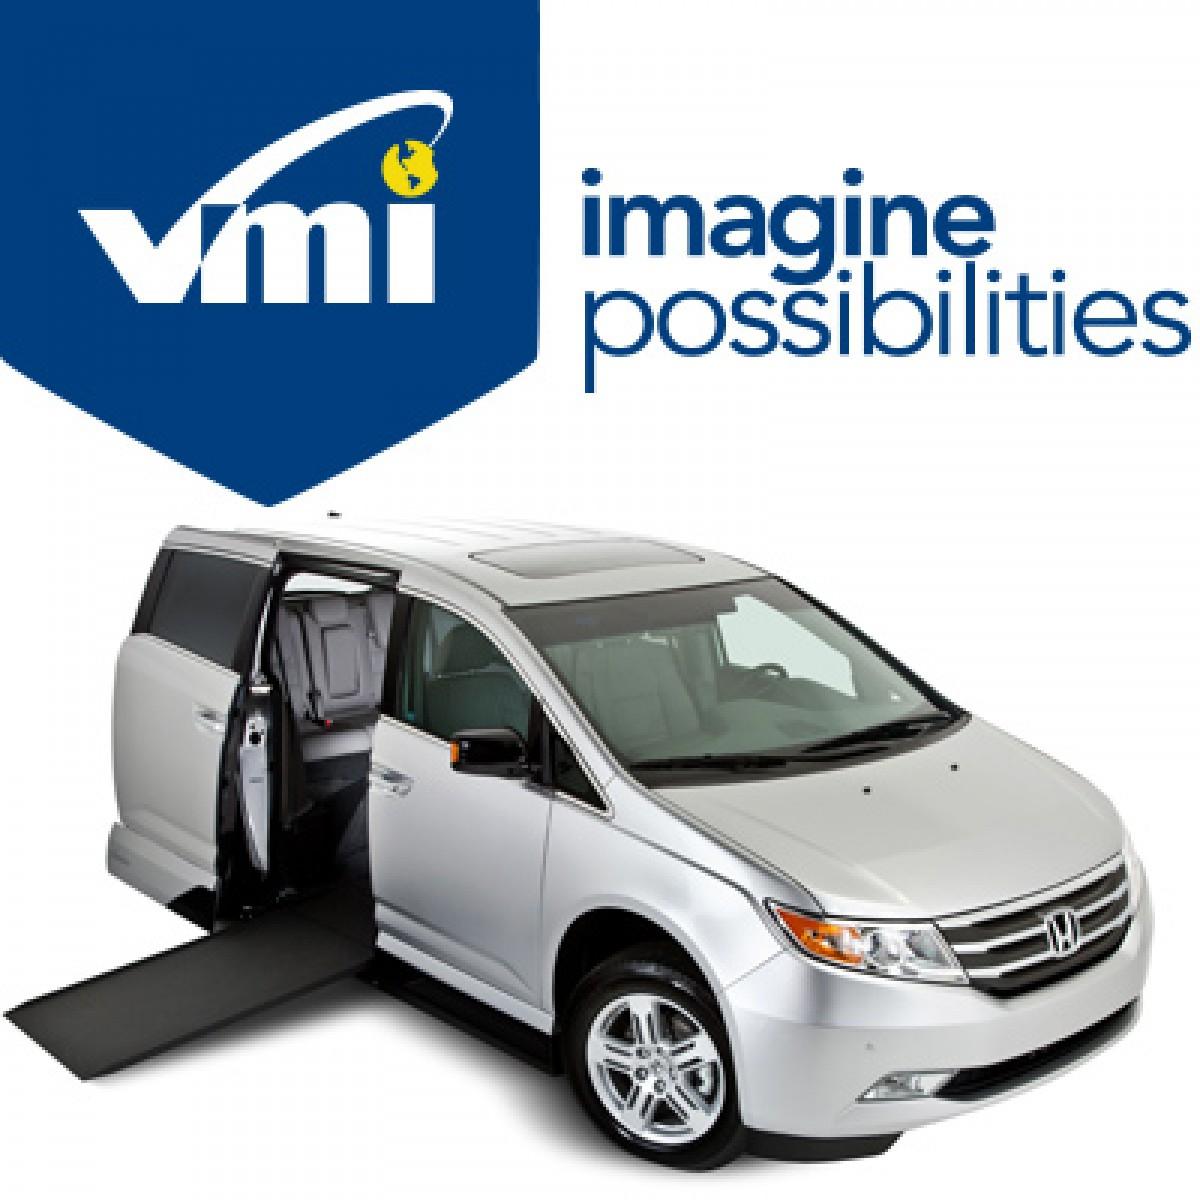 Craigslist handicap vans for sale in houston - Vmi Wheelchair Vans